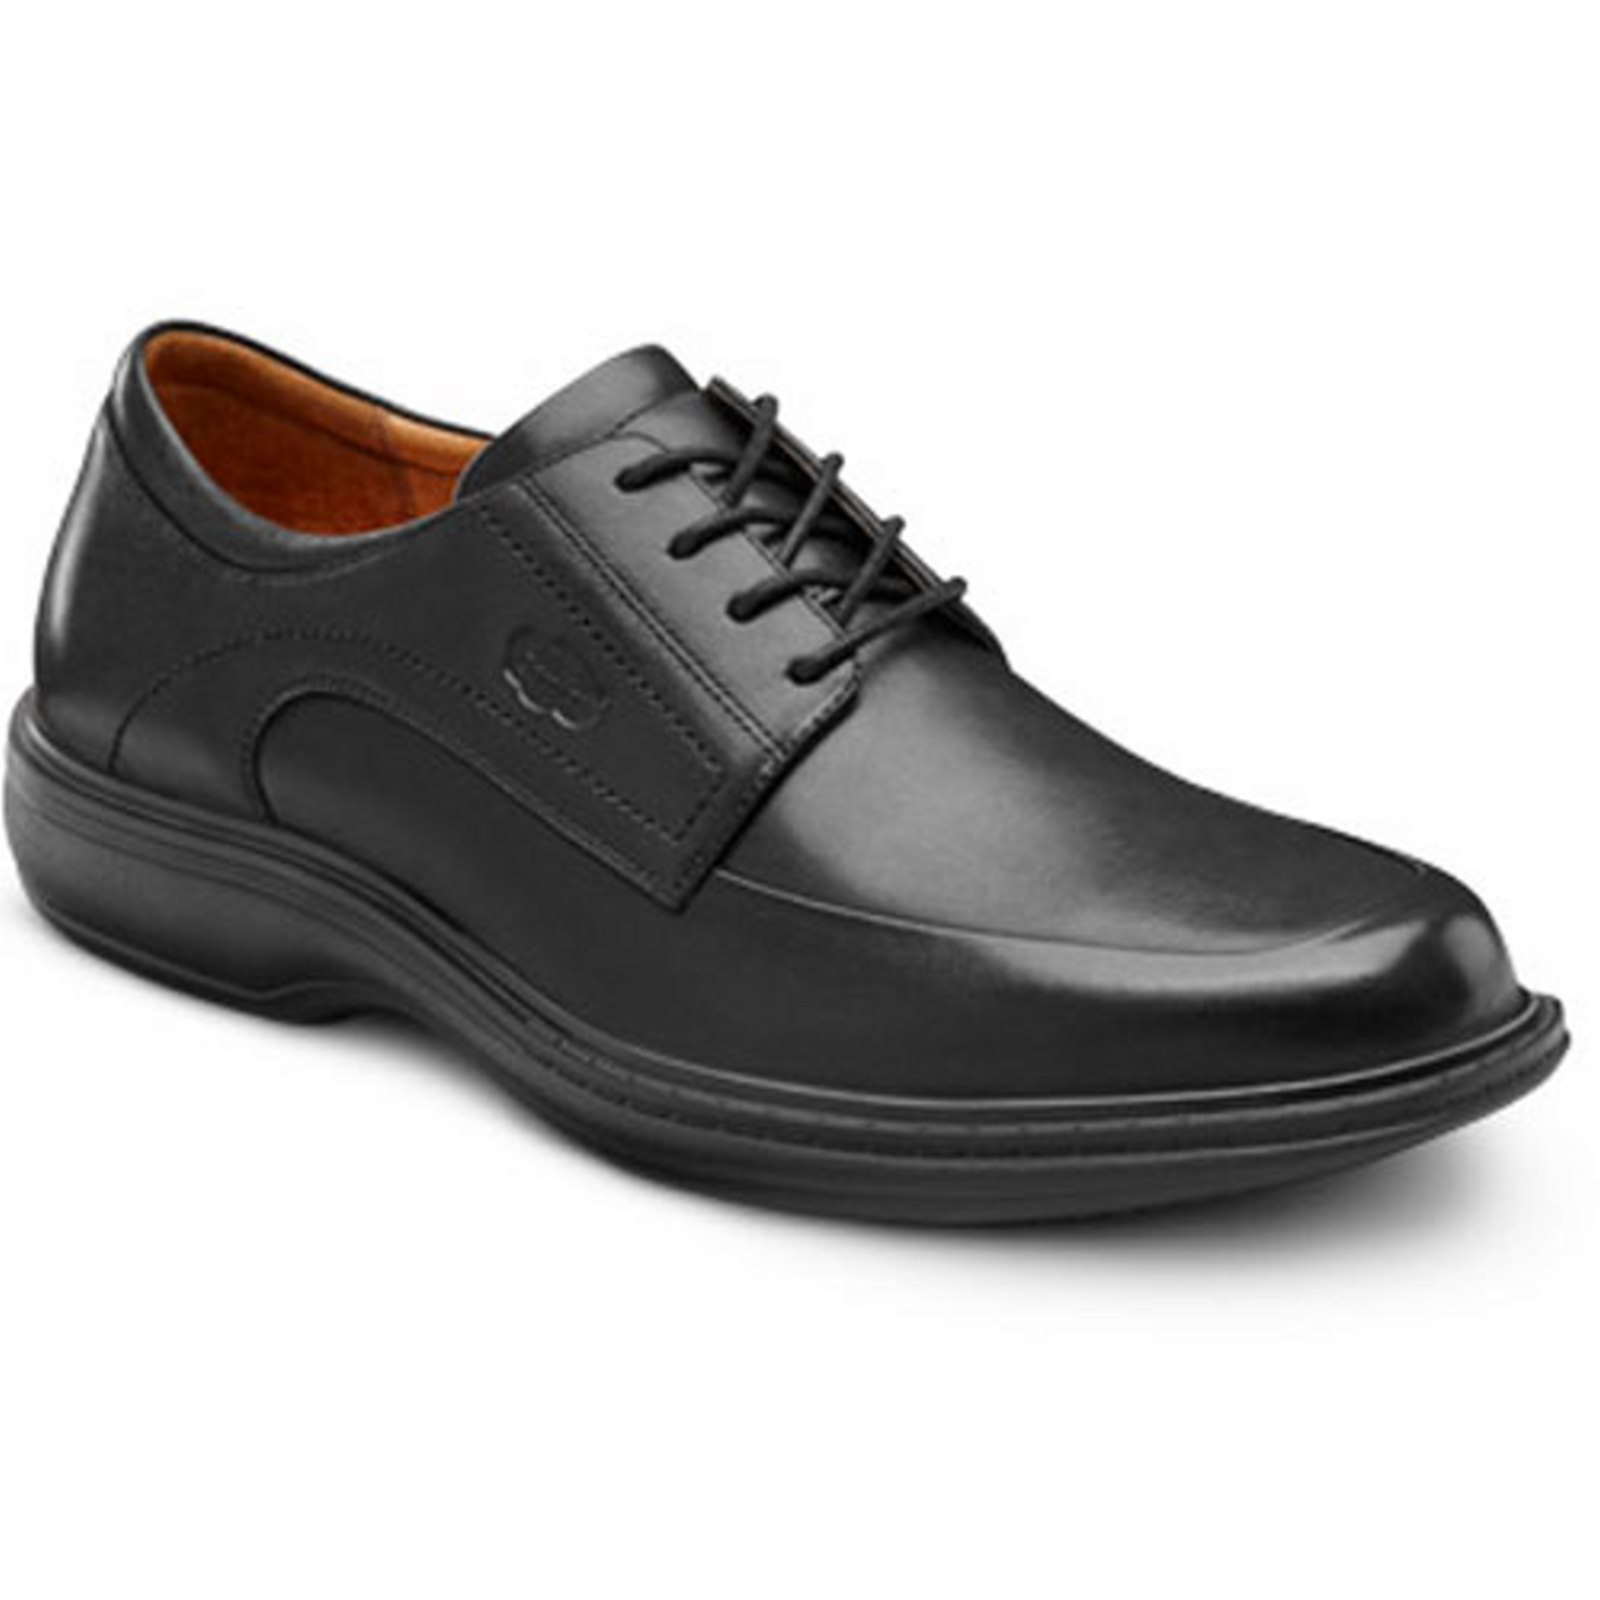 mens dress shoes 4e width